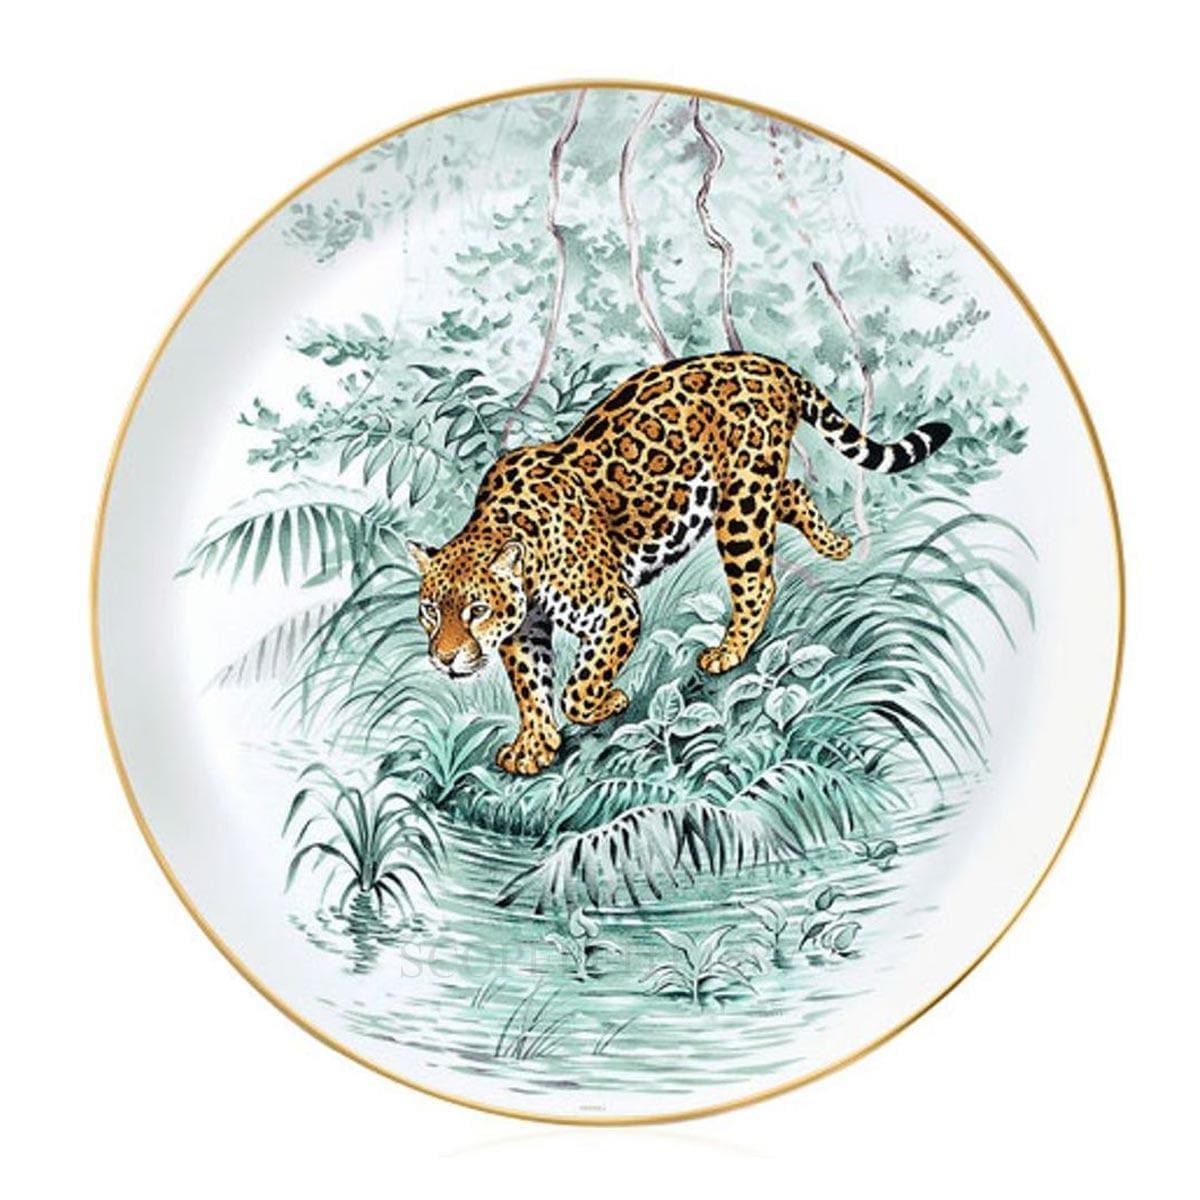 Hermes Carnets d'Equateur Tart Platter